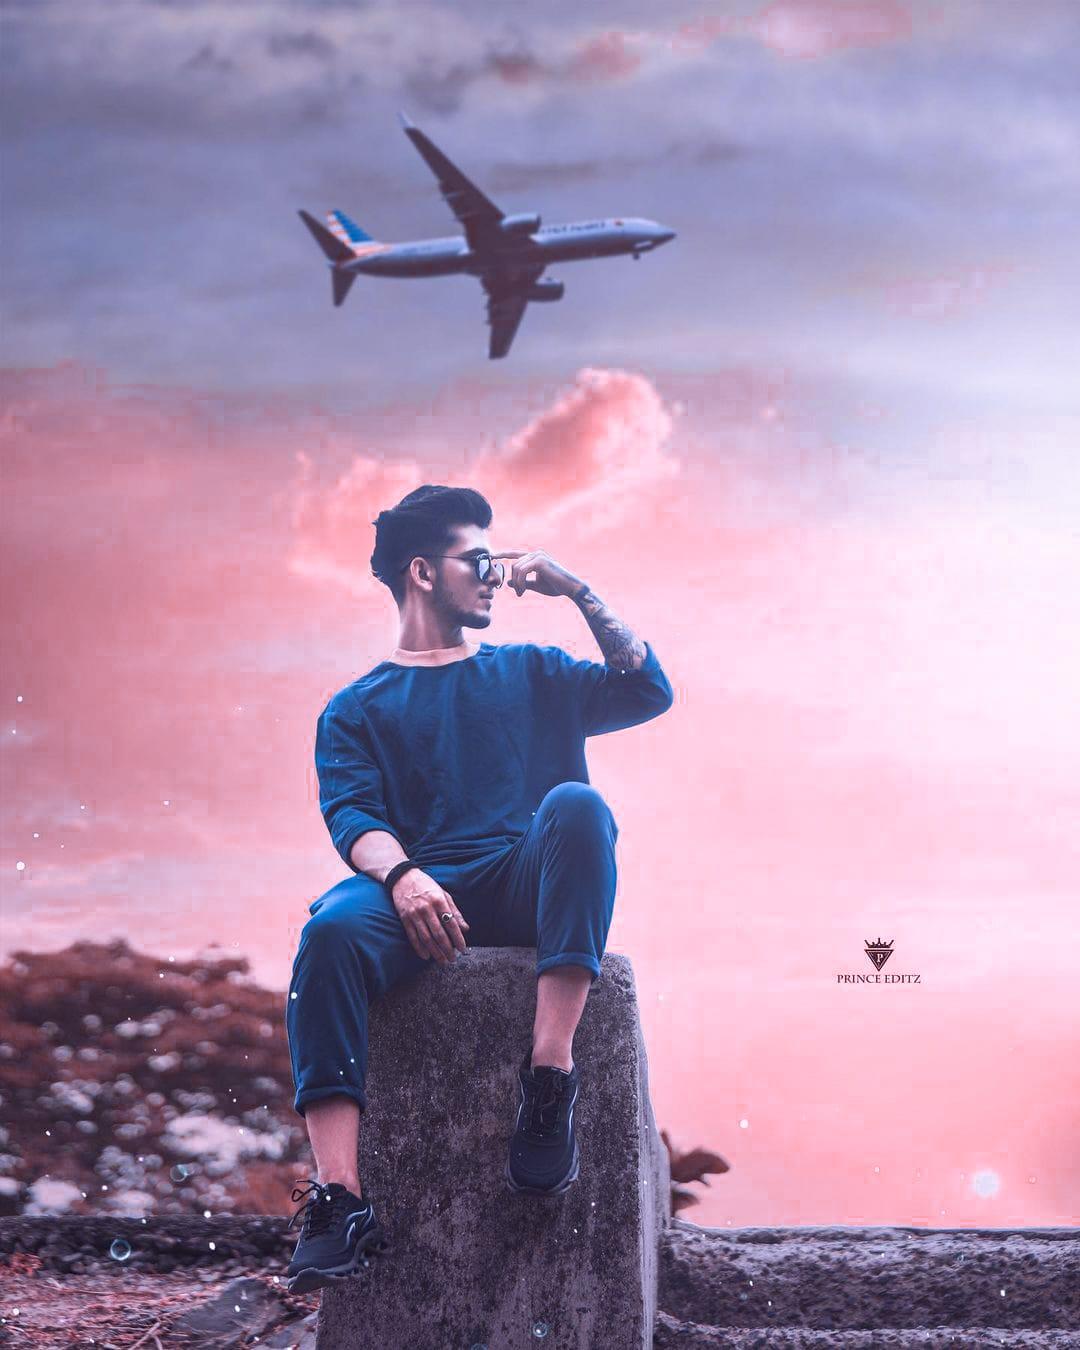 Snapseed Airplane editing